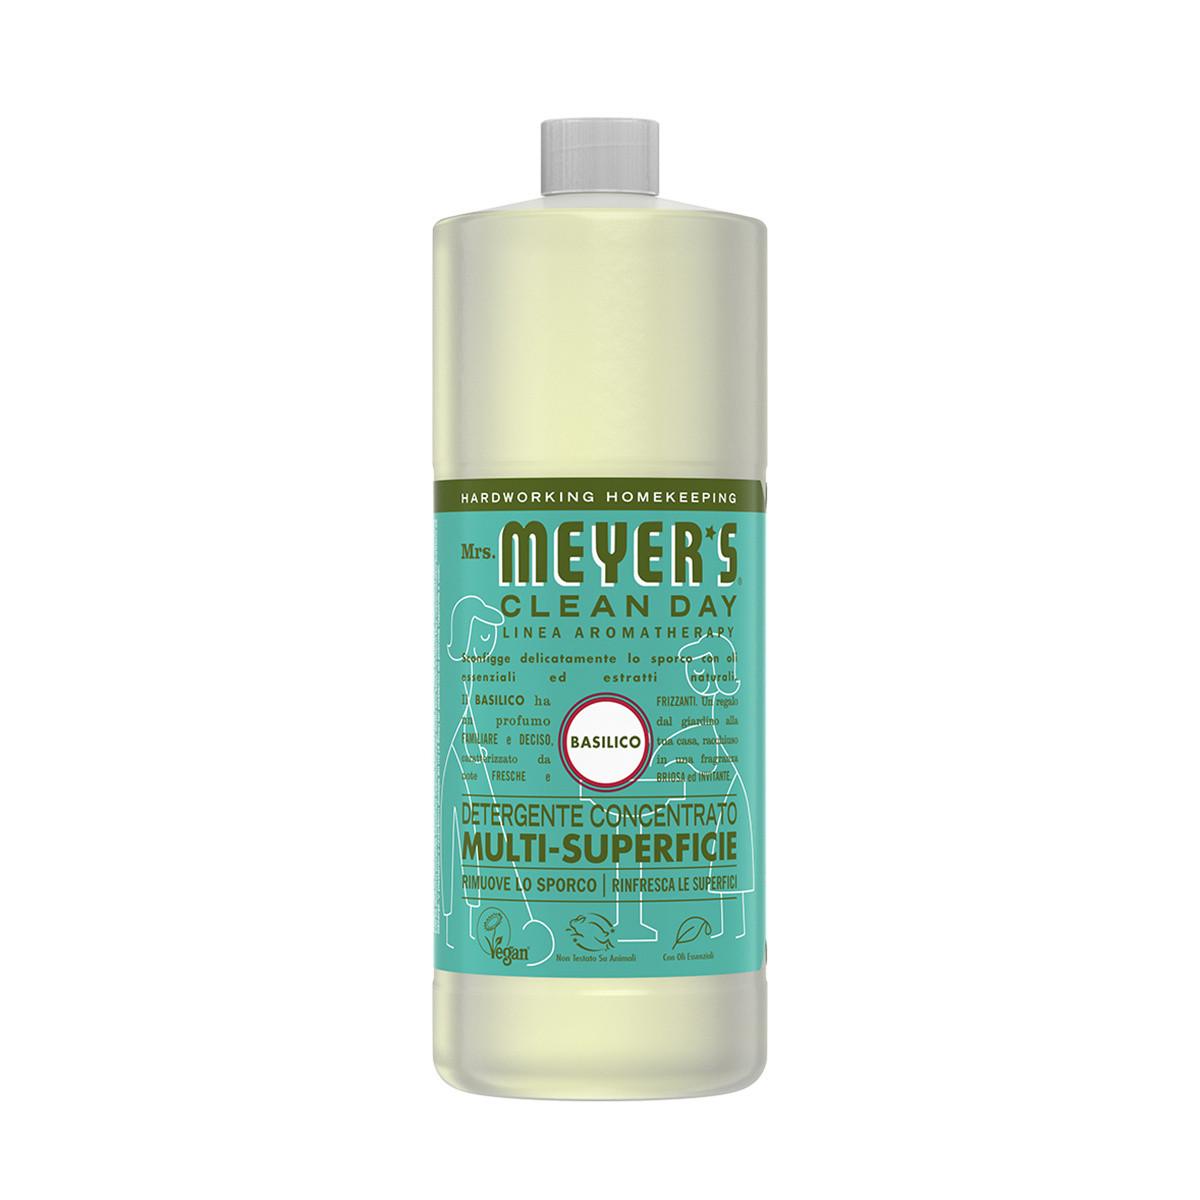 Detergente concentrato multi-supericie profumo di basilico 946ml, Verde smeraldo, large image number 0